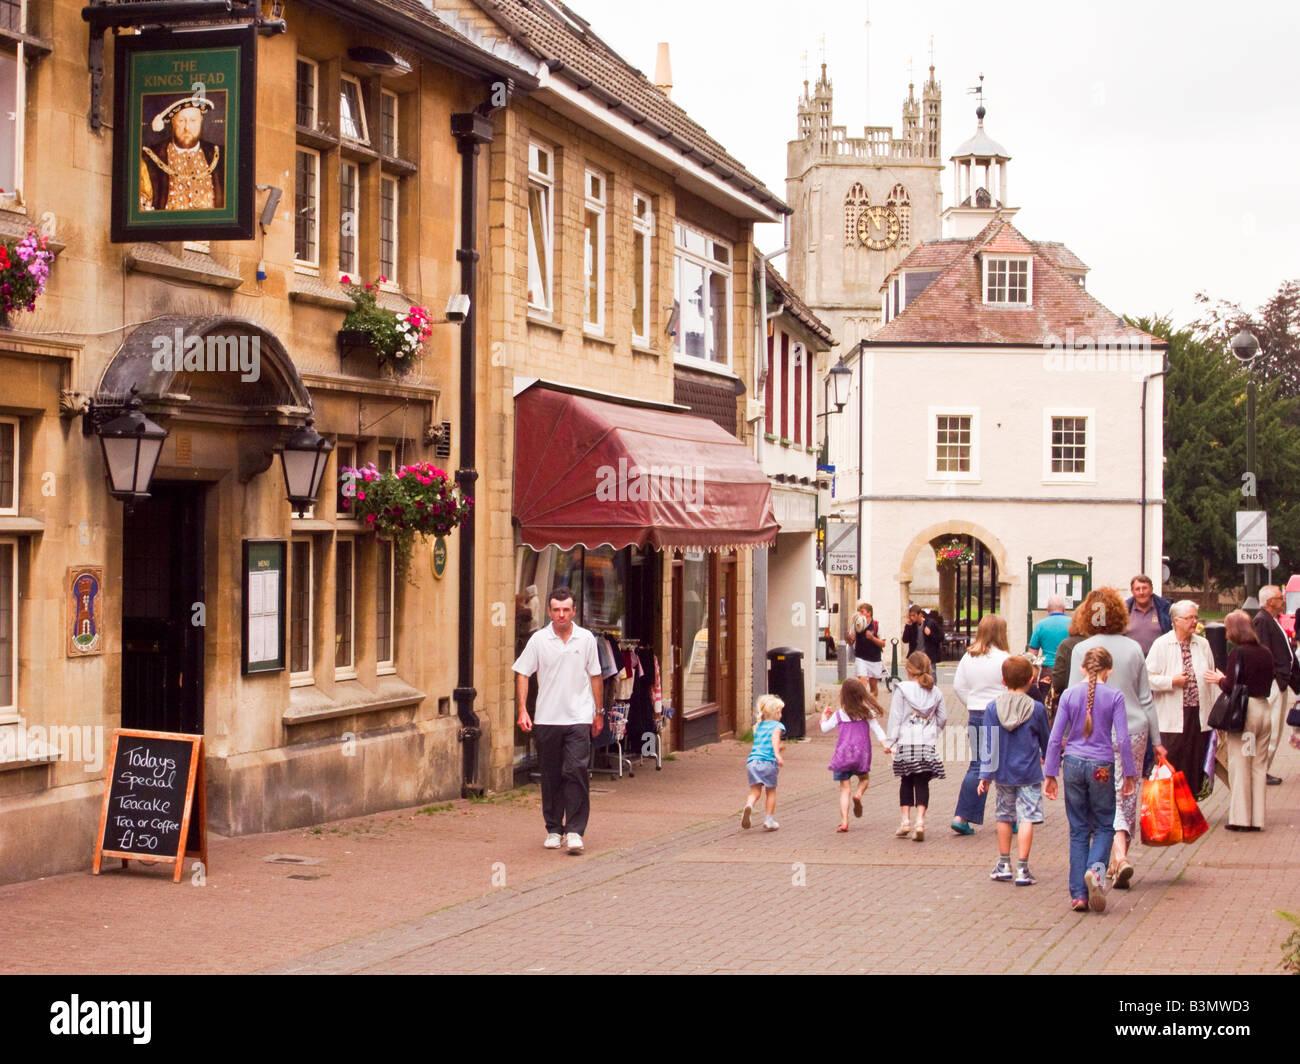 Pedestrian precinct with public house in Dursley Gloucestershire England UK EU - Stock Image